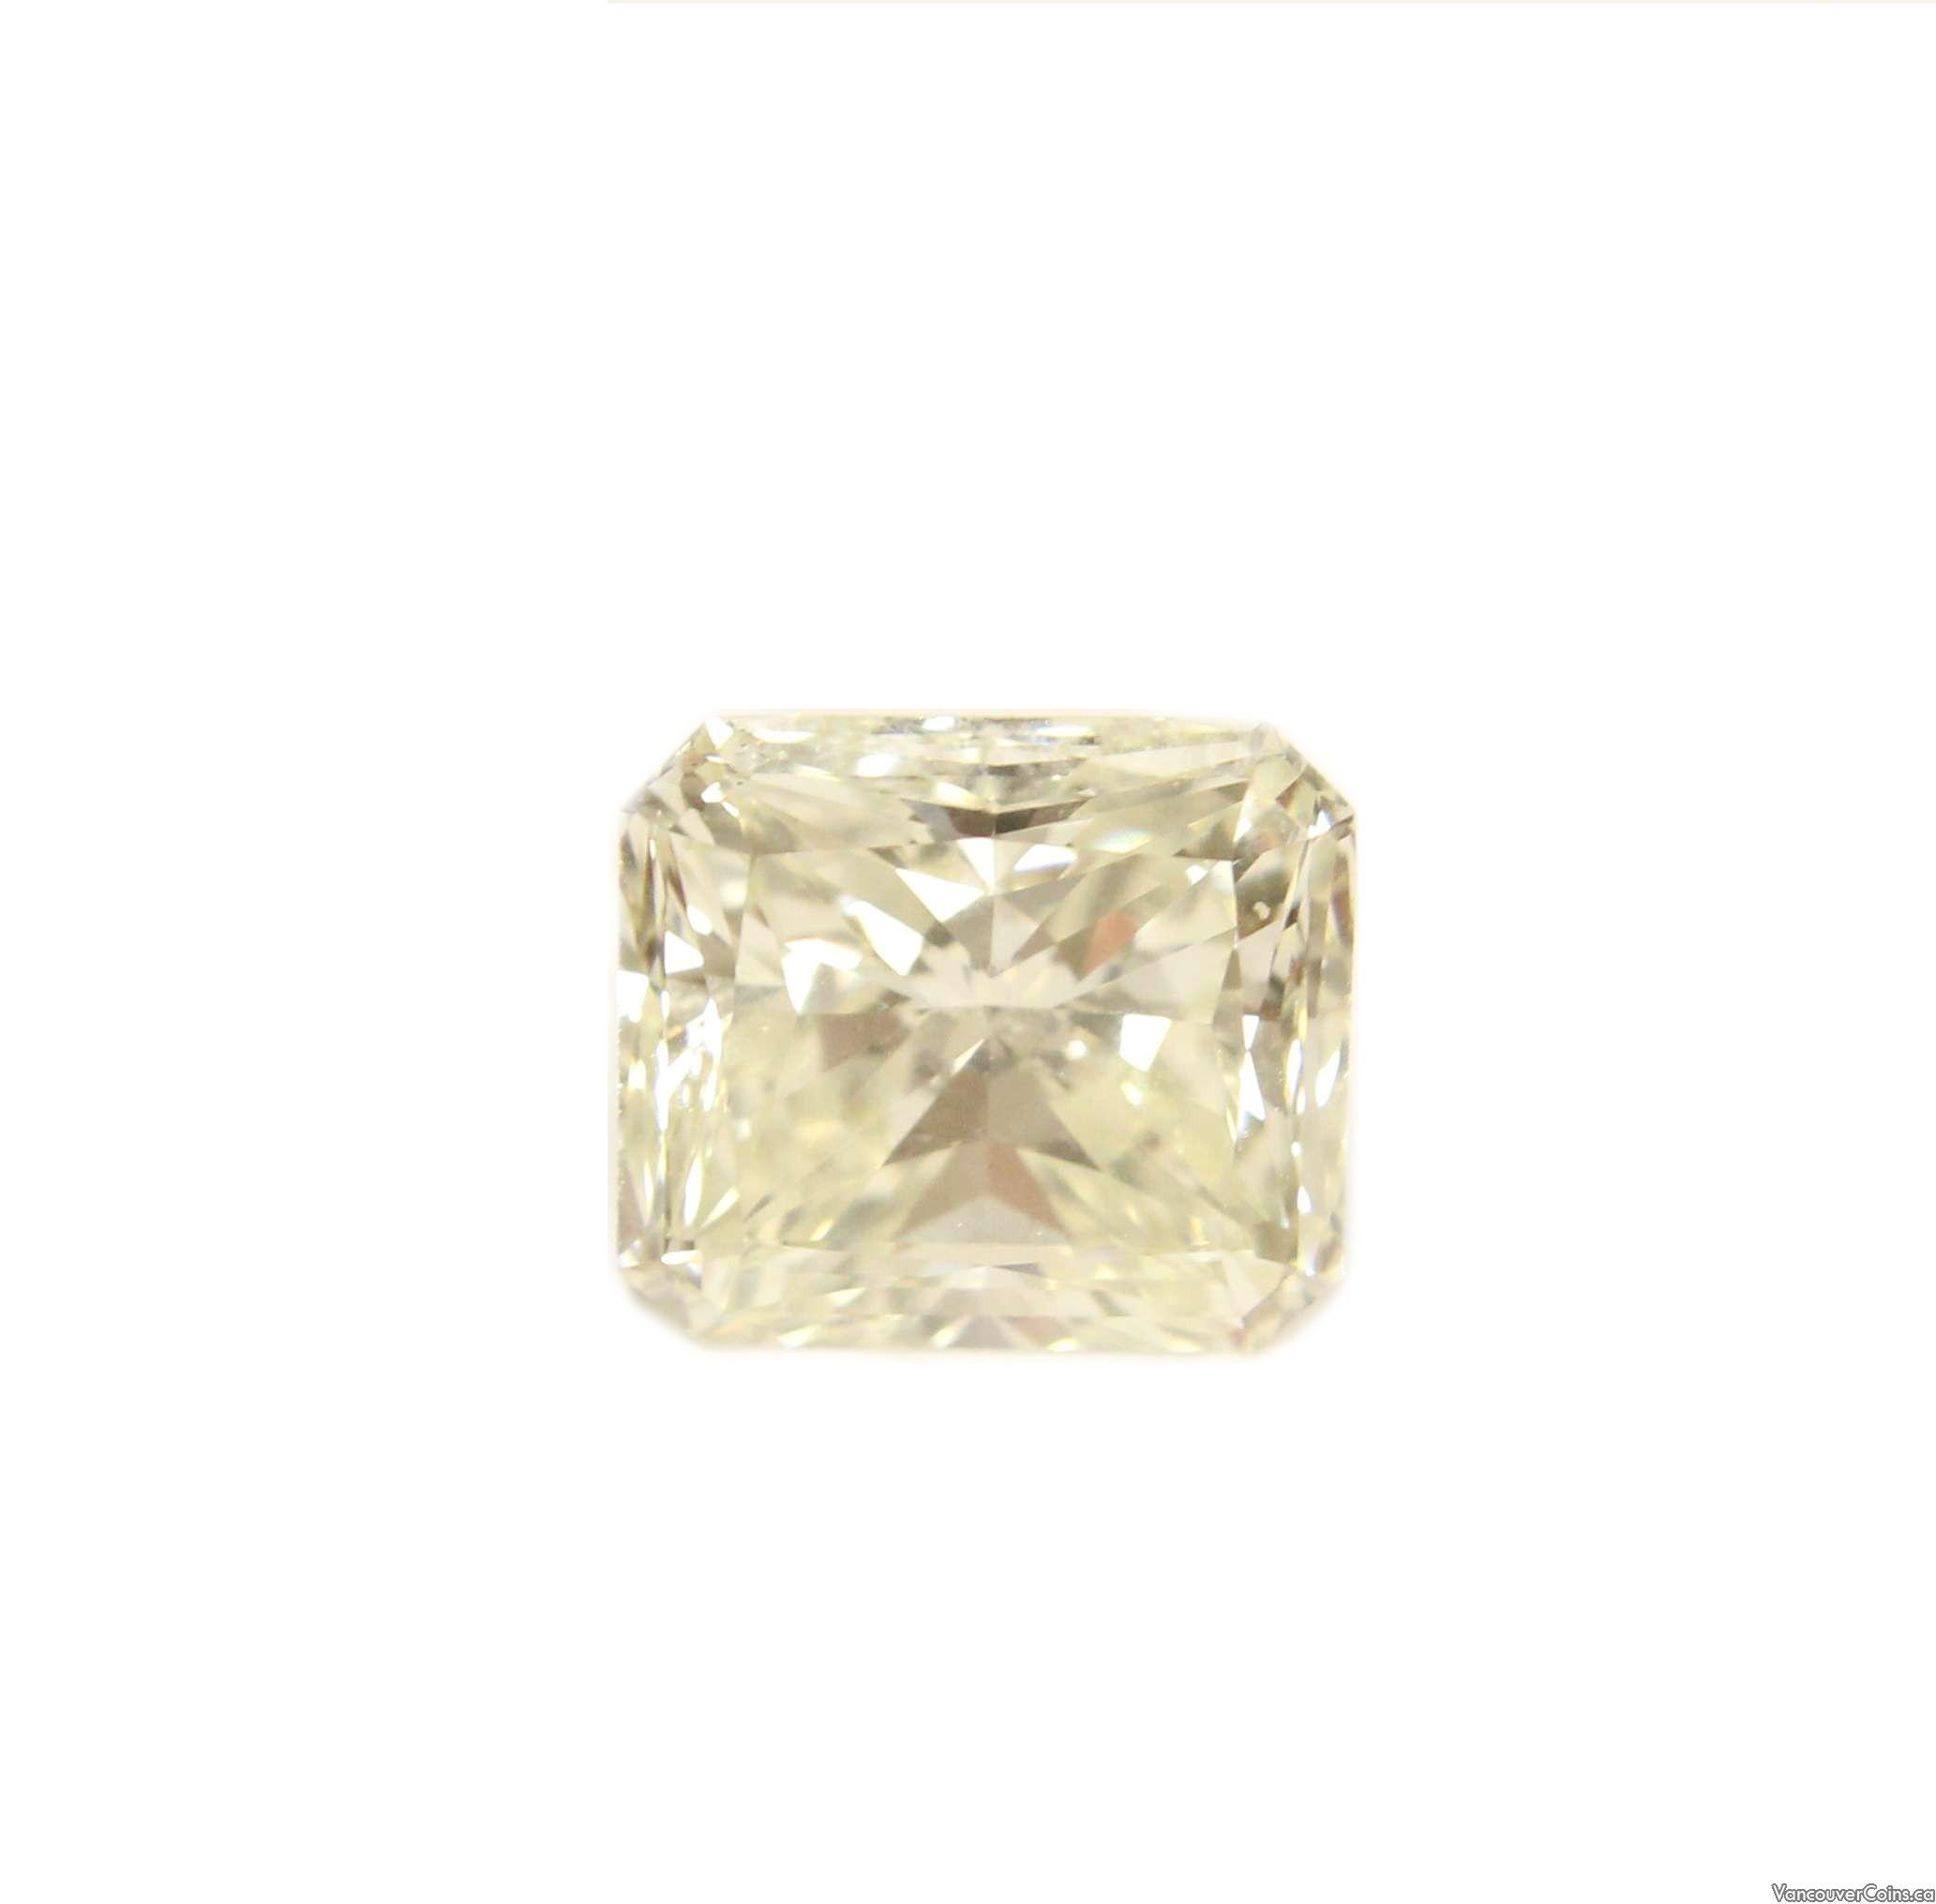 9.07 carat L VS2 Radiant cut Diamond natural untreated & Rare